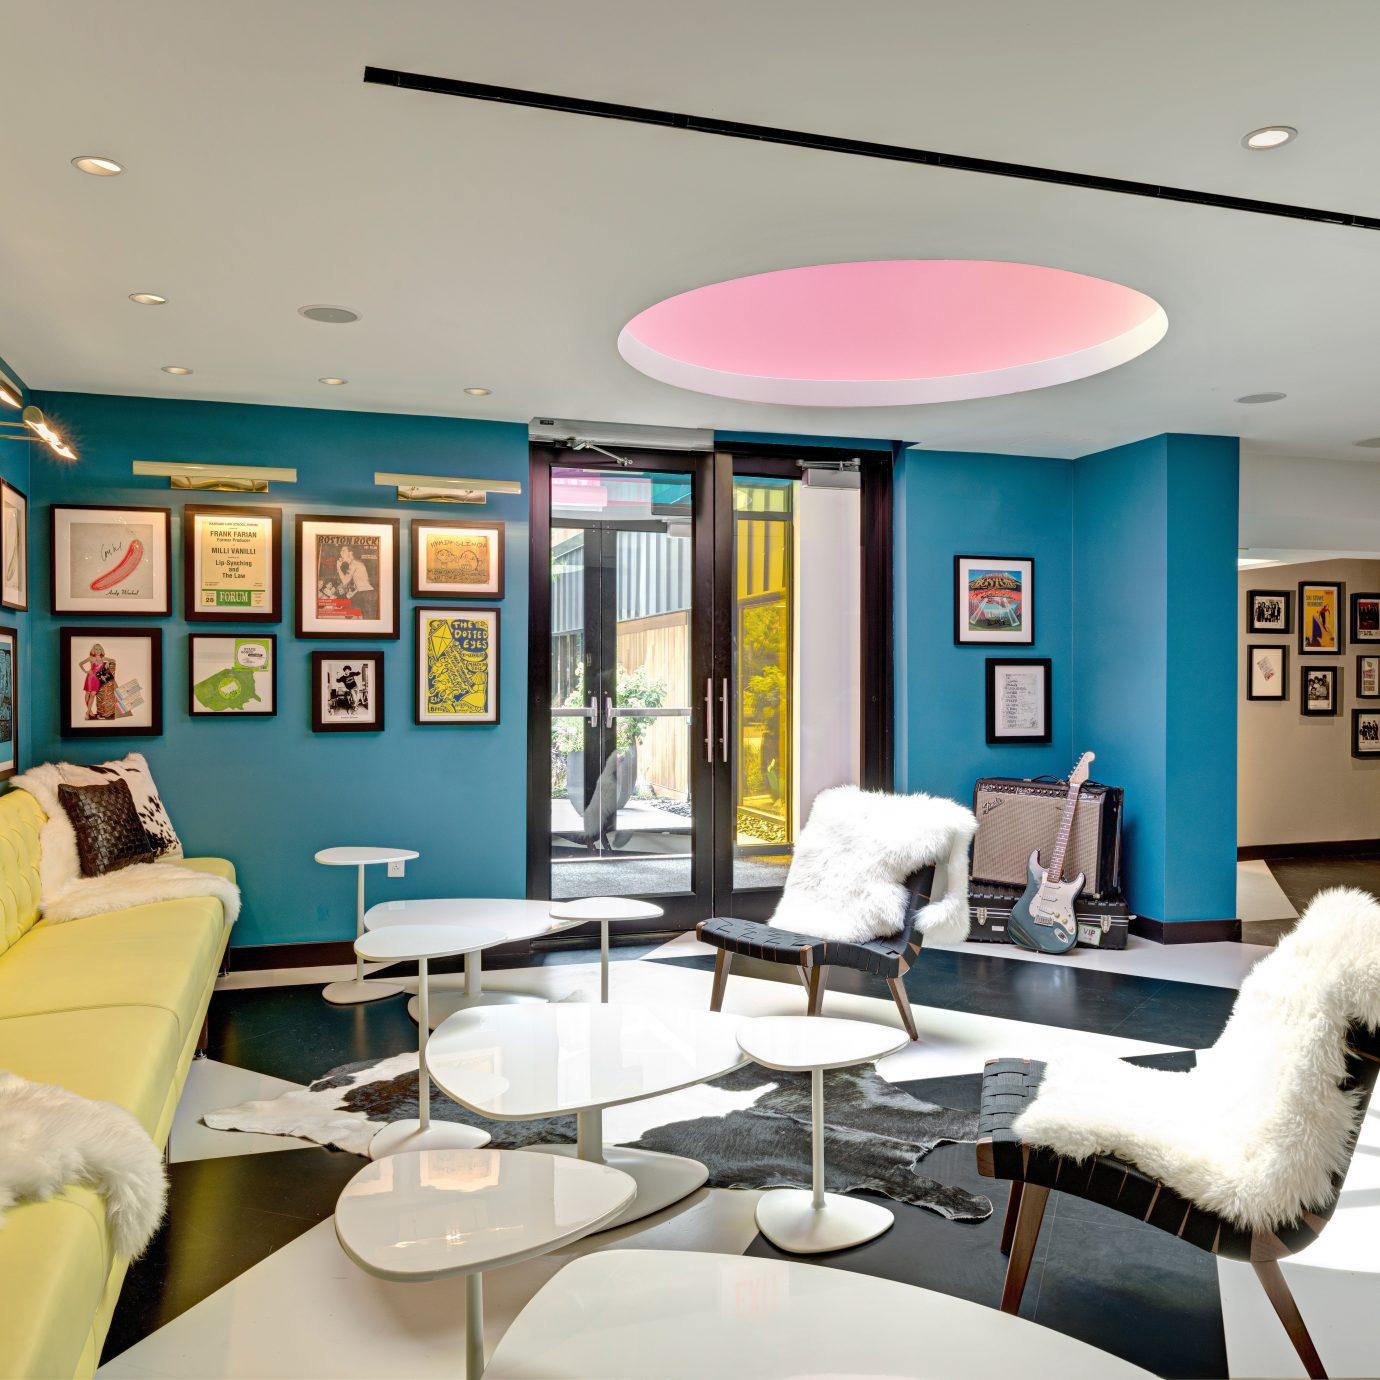 Budget City Hip Lounge property living room chair home condominium Modern